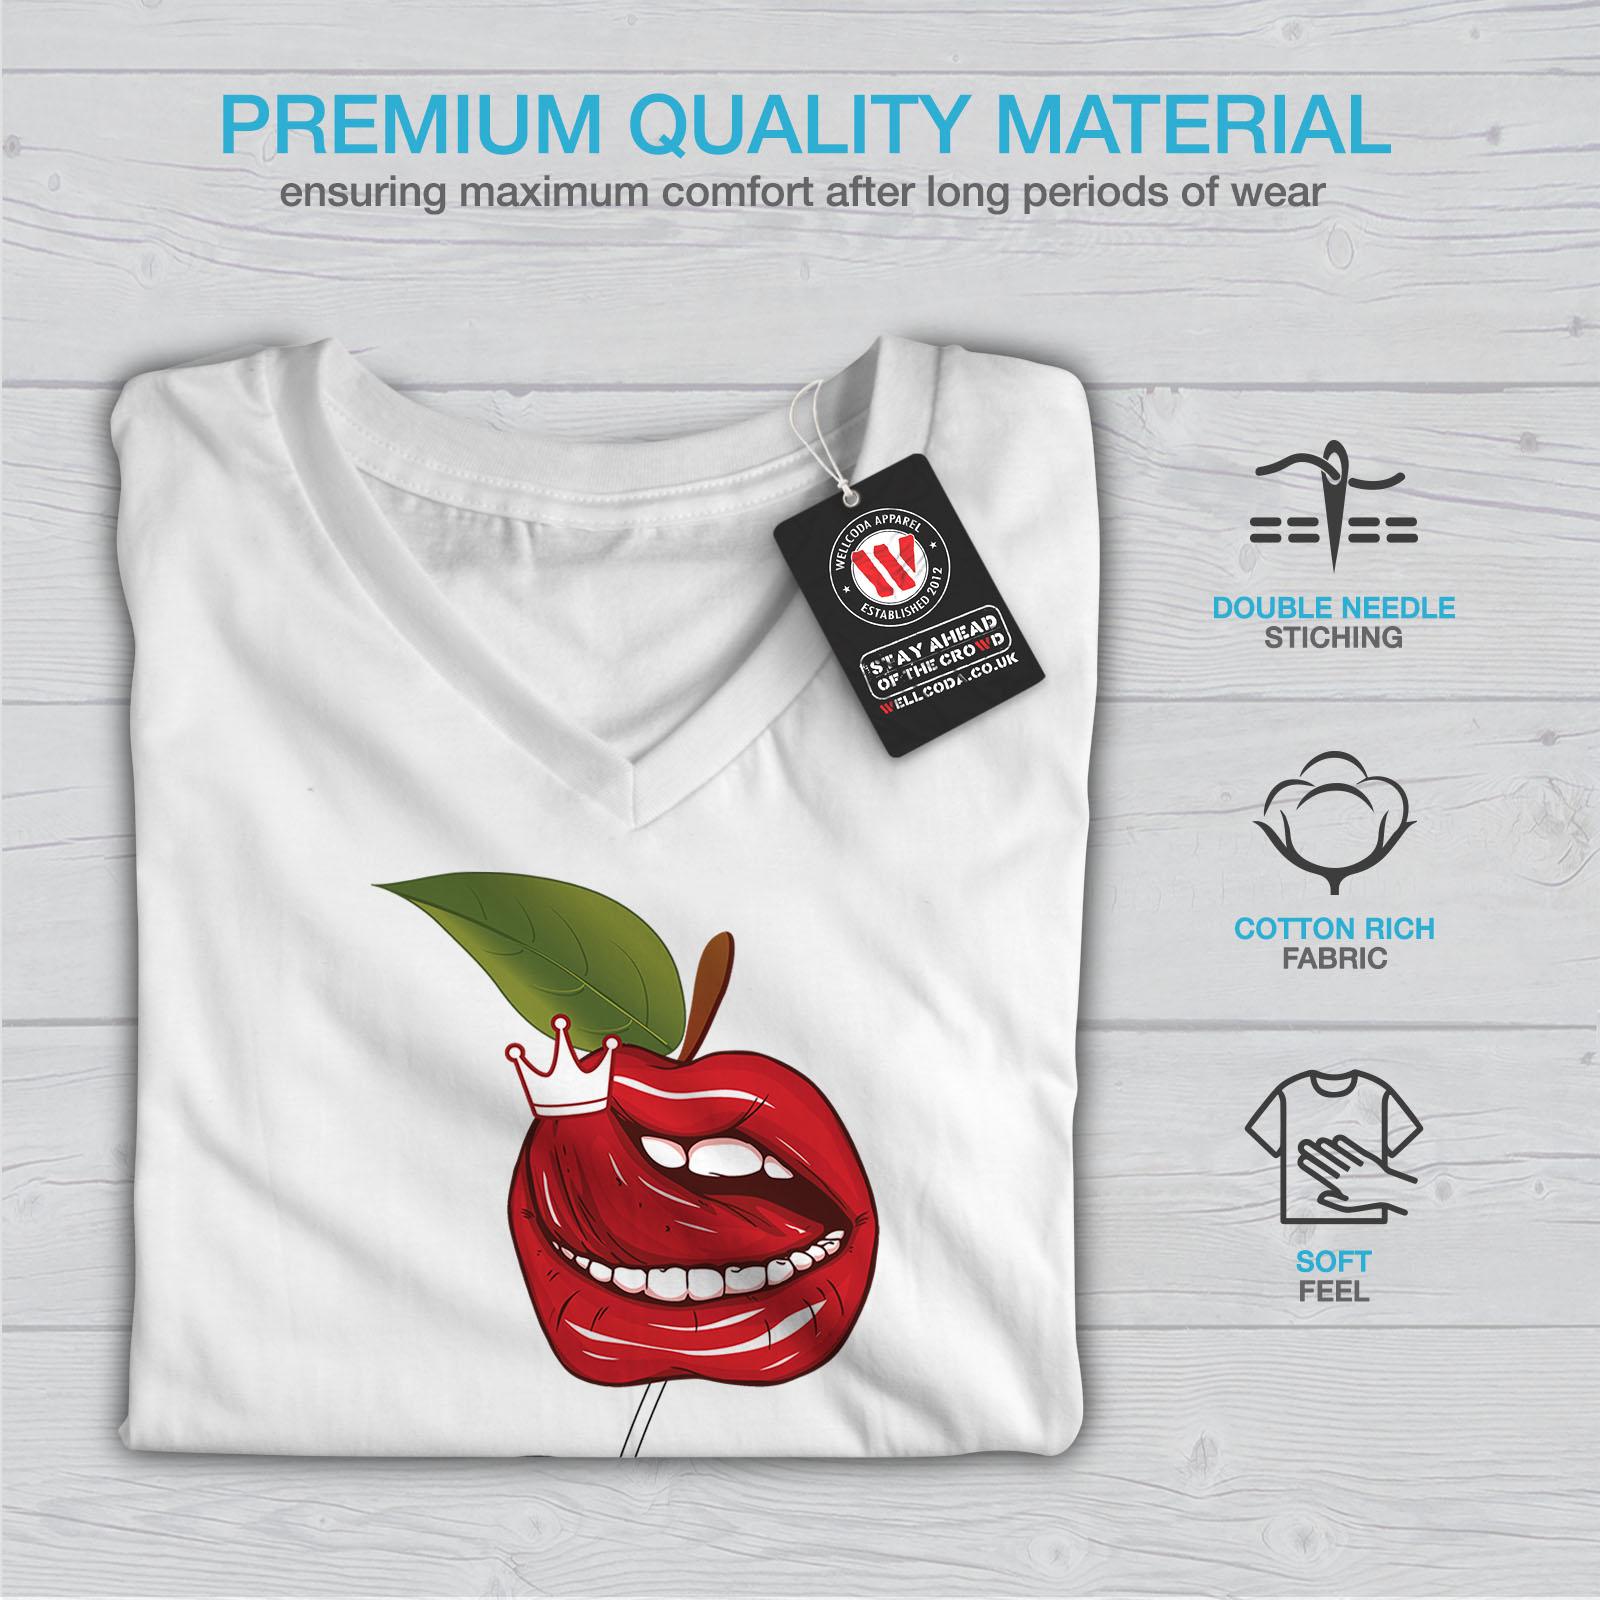 Wellcoda-Lip-Cherry-Cool-Womens-V-Neck-T-shirt-Rock-amp-Roll-Graphic-Design-Tee thumbnail 9